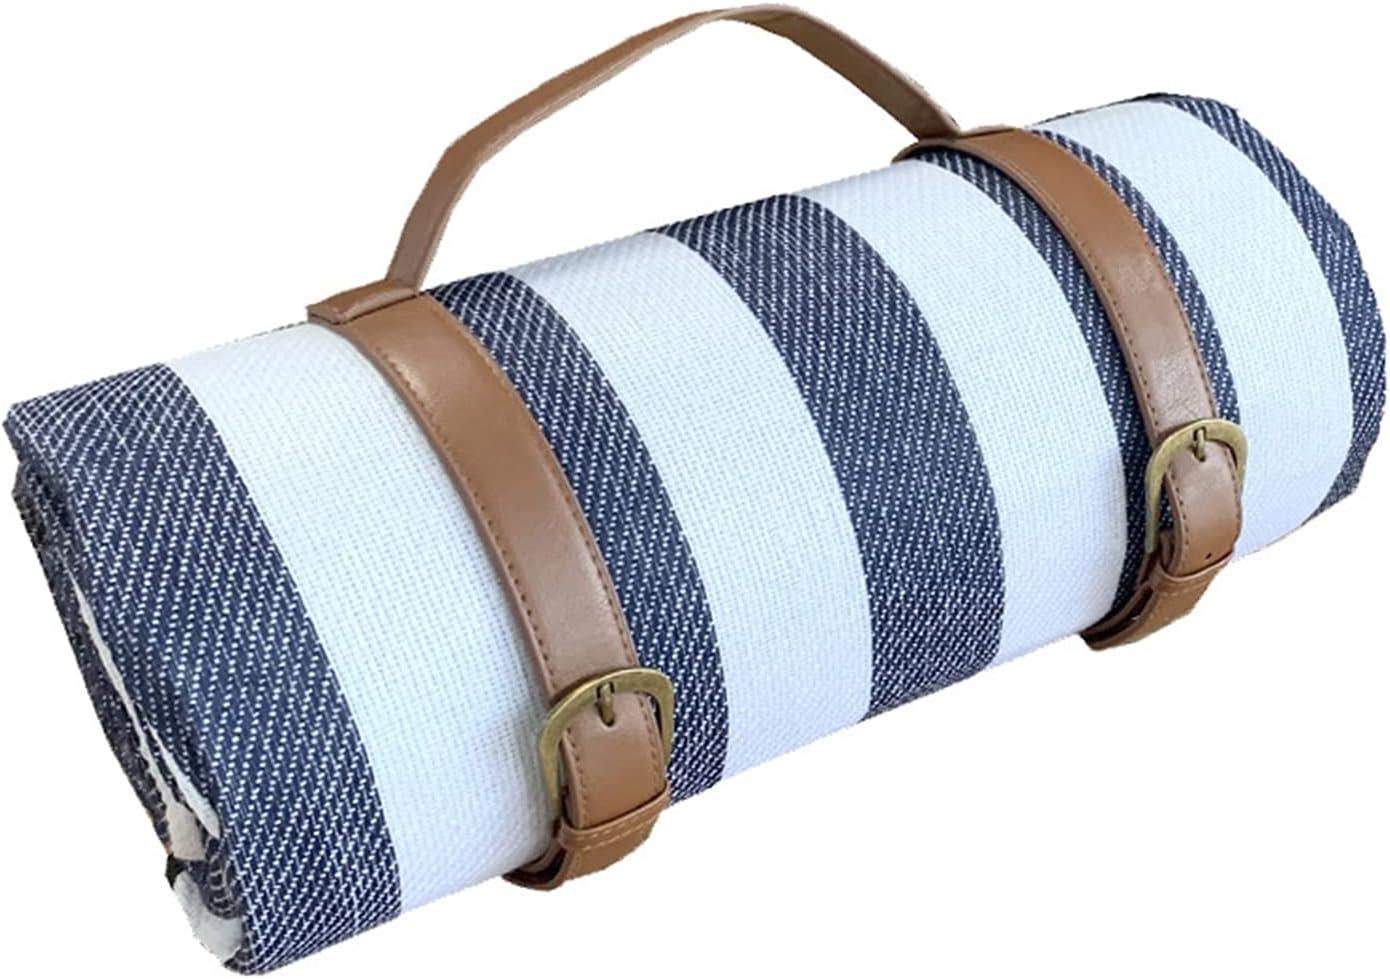 cheap yangmeng Waterproof Picnic Blanket Plaid Folding Gorgeous Printing Campi